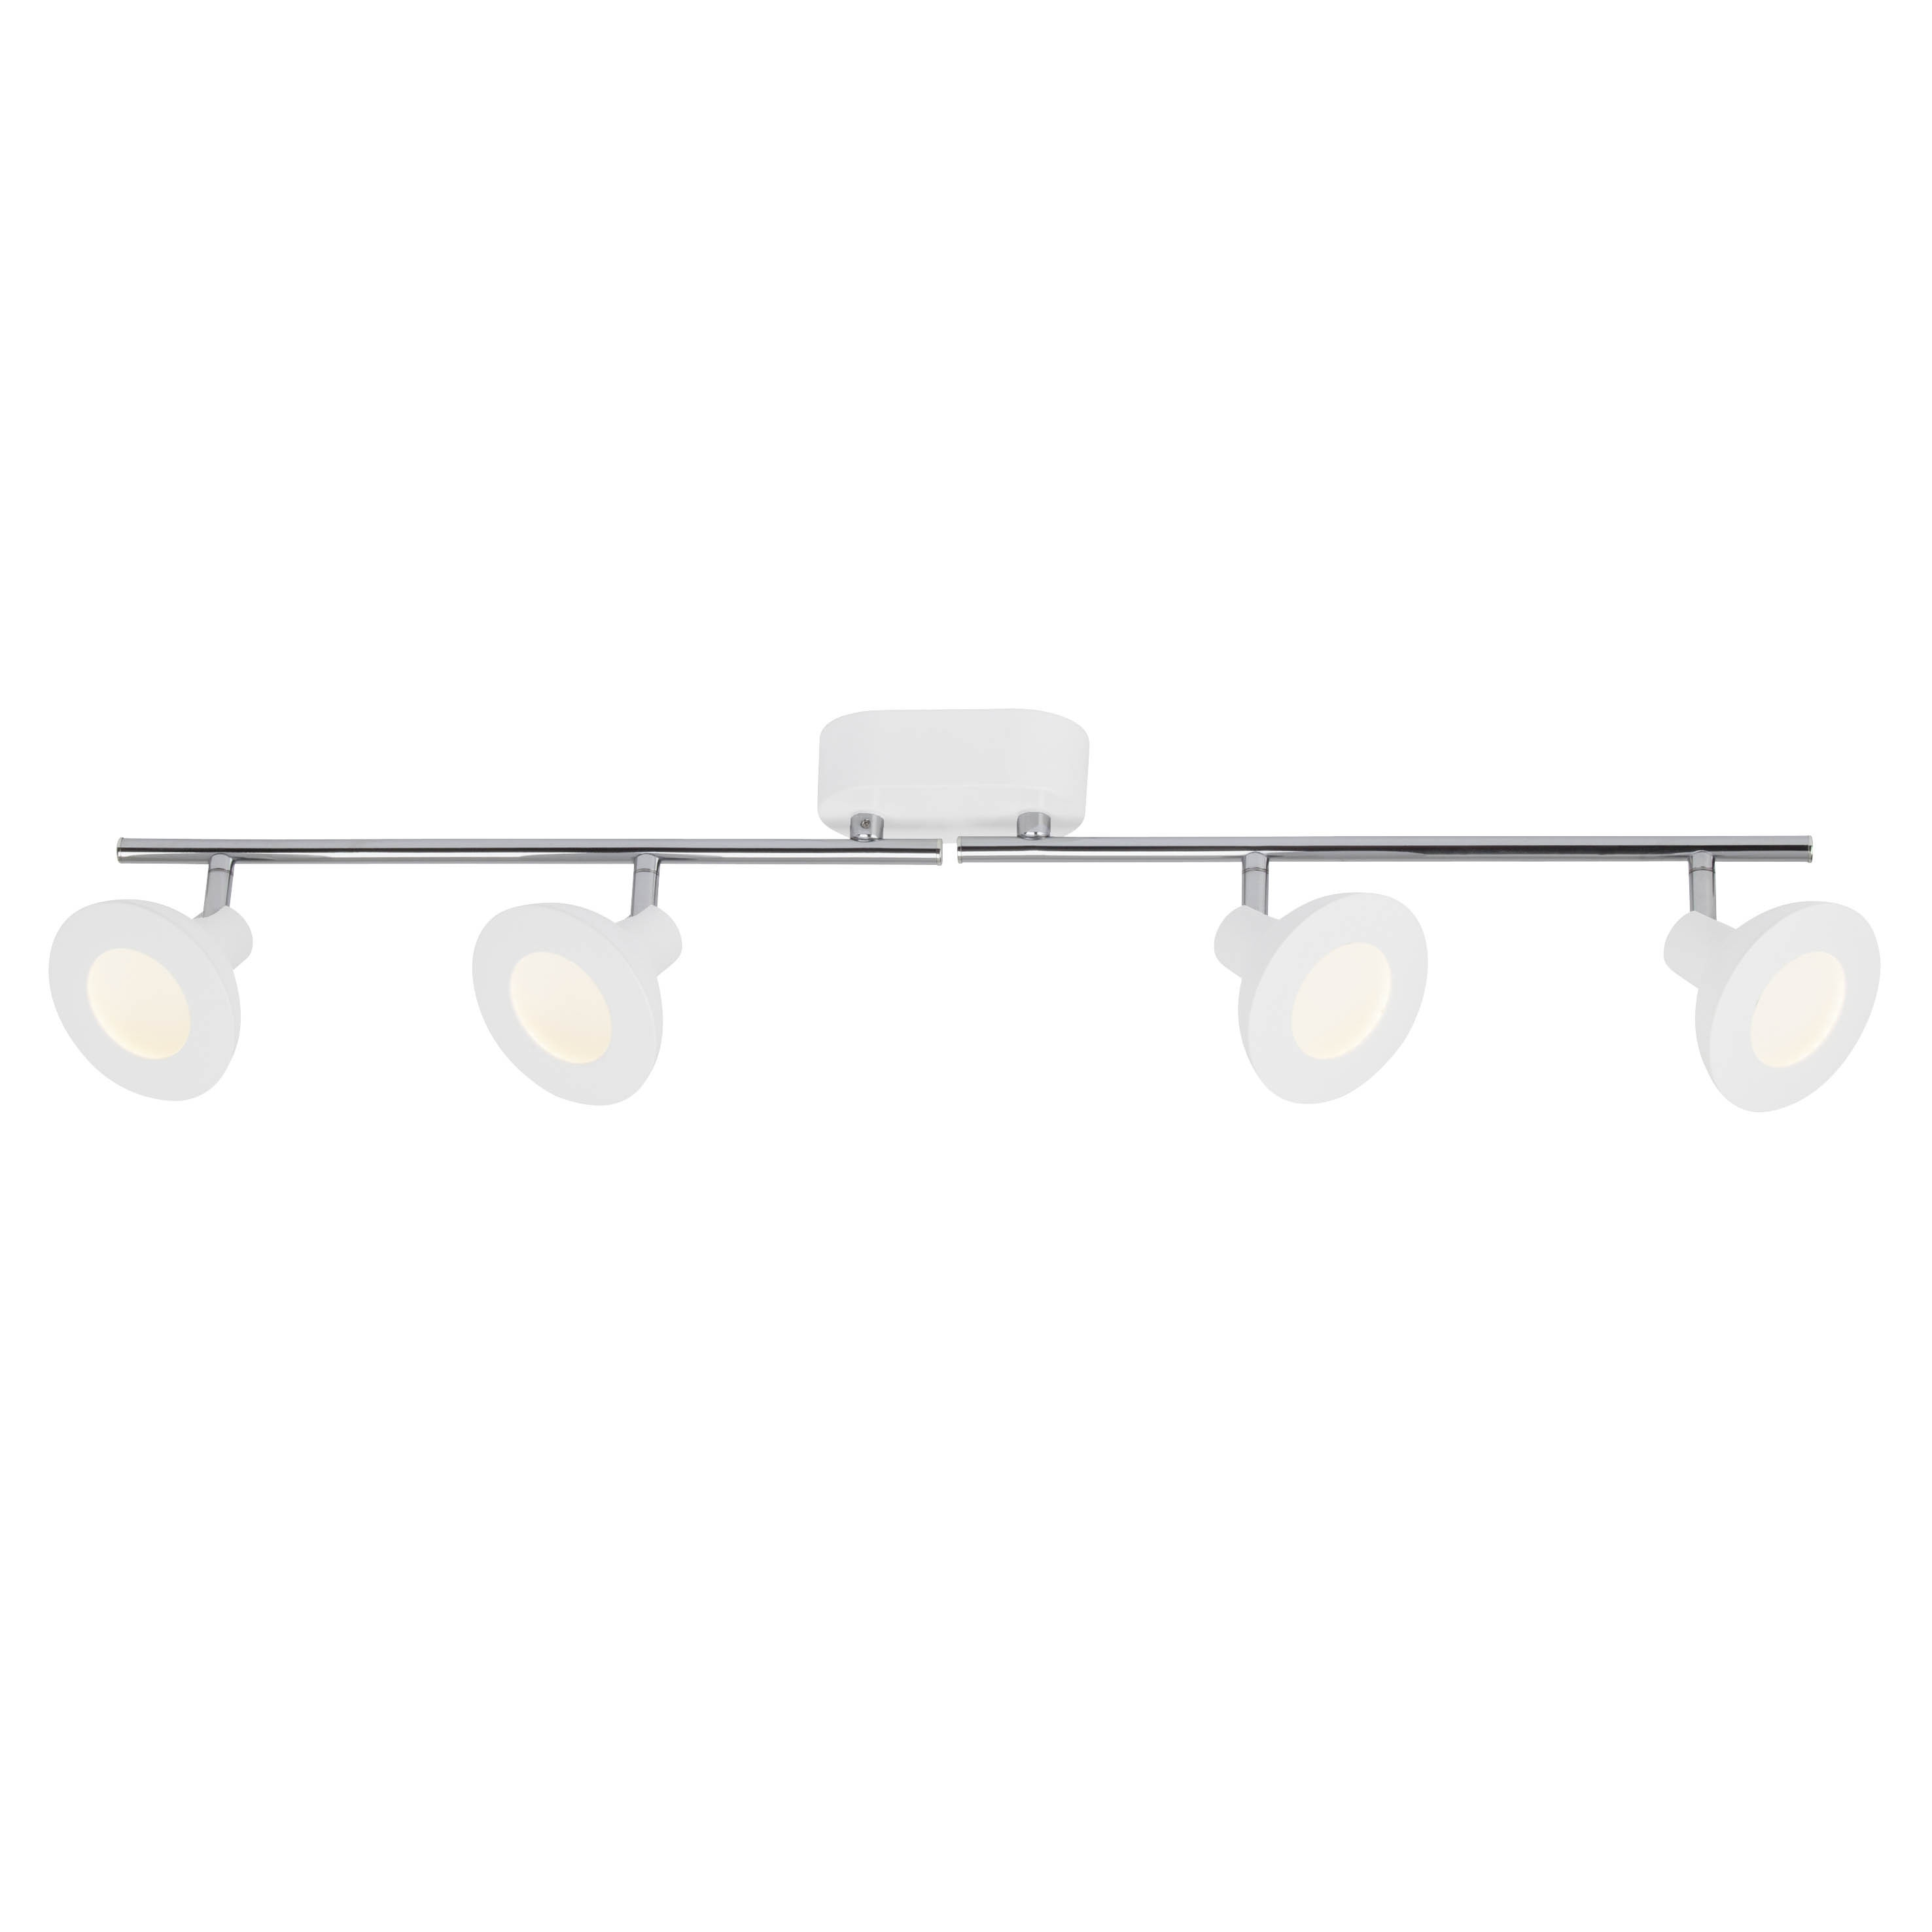 AEG Titania LED Spotrohr 4flg weiÃY/chrom